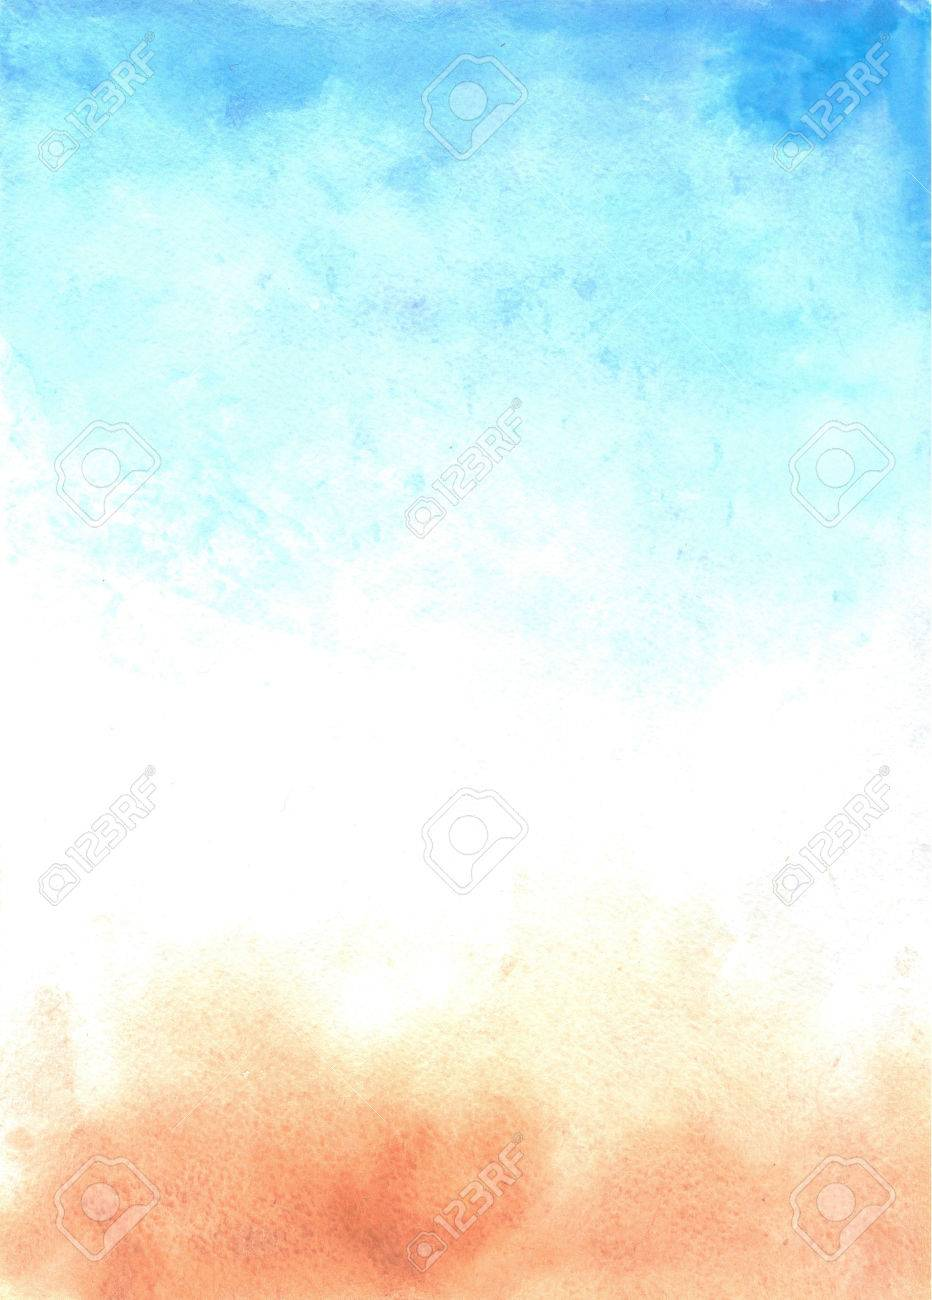 Watercolor hintergrund free